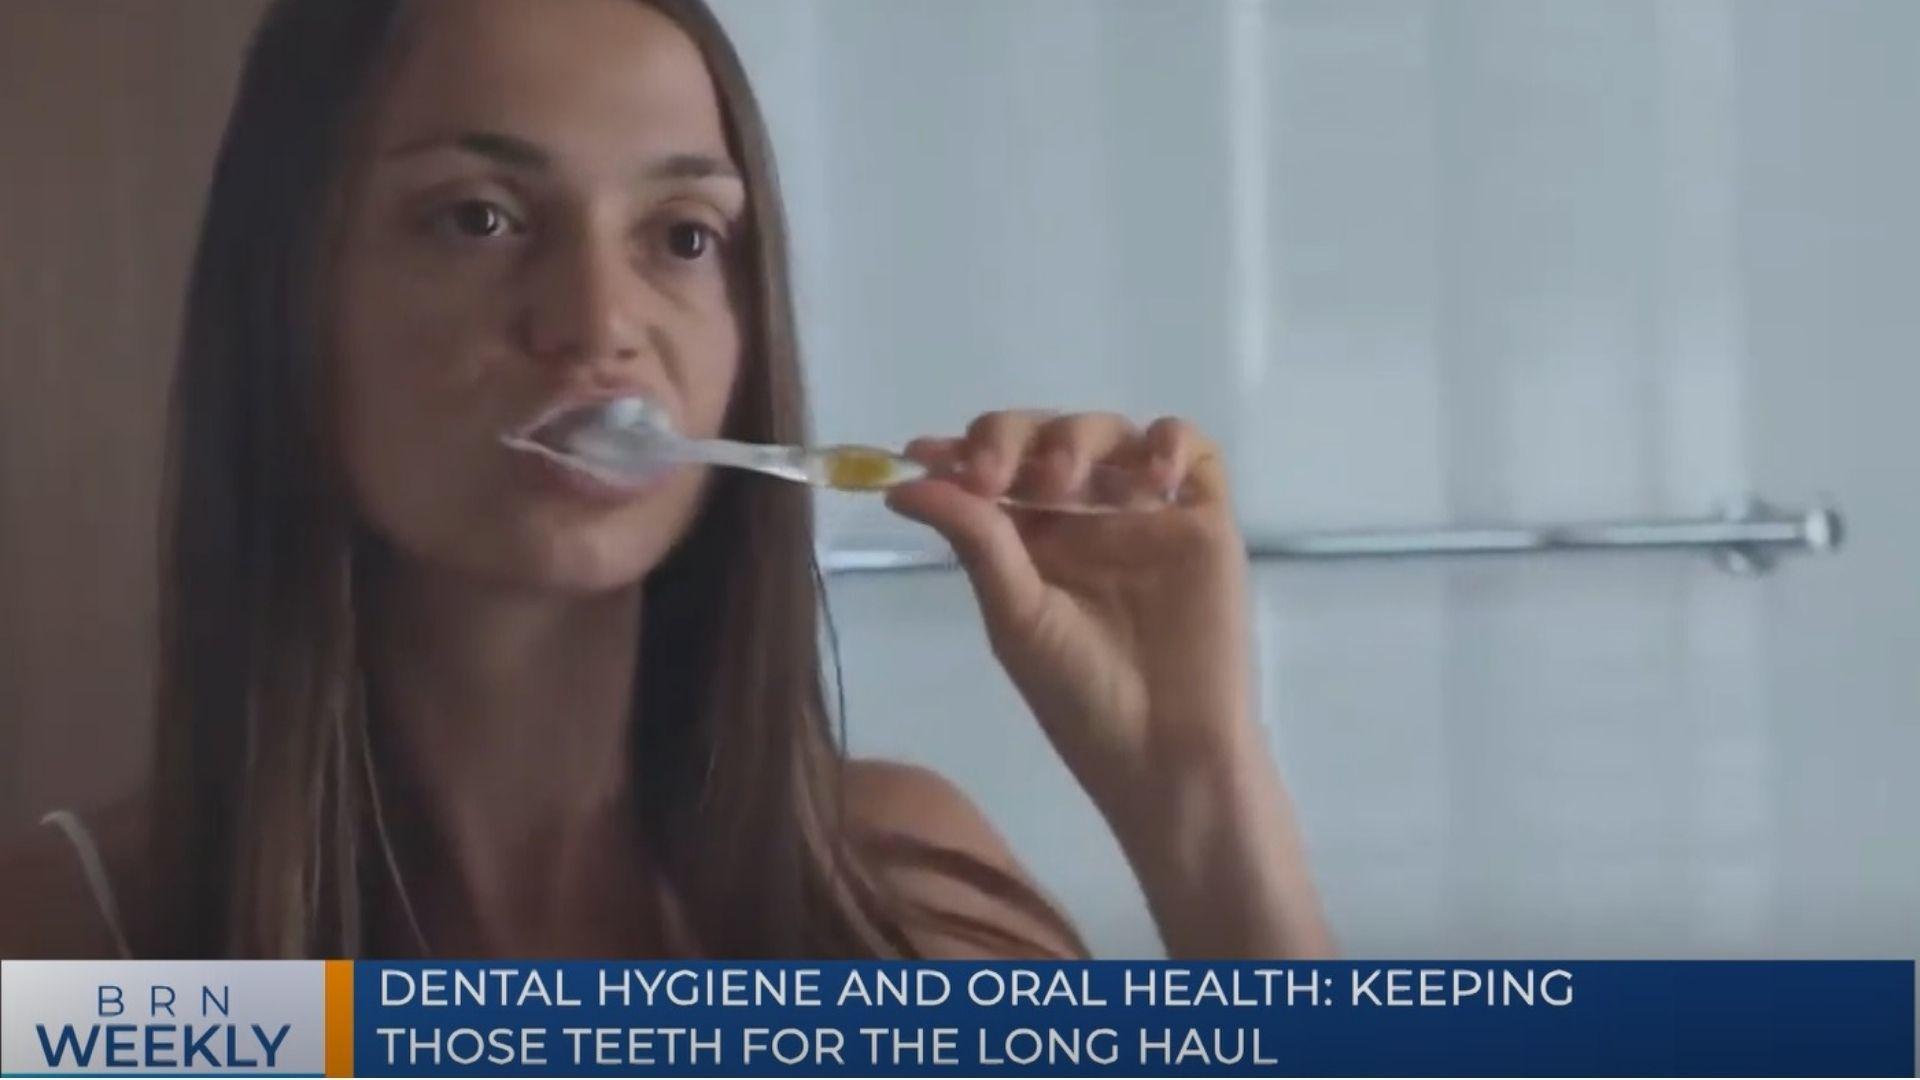 BRN Weekly   Dental hygiene and oral health: Keeping those teeth for the long haul